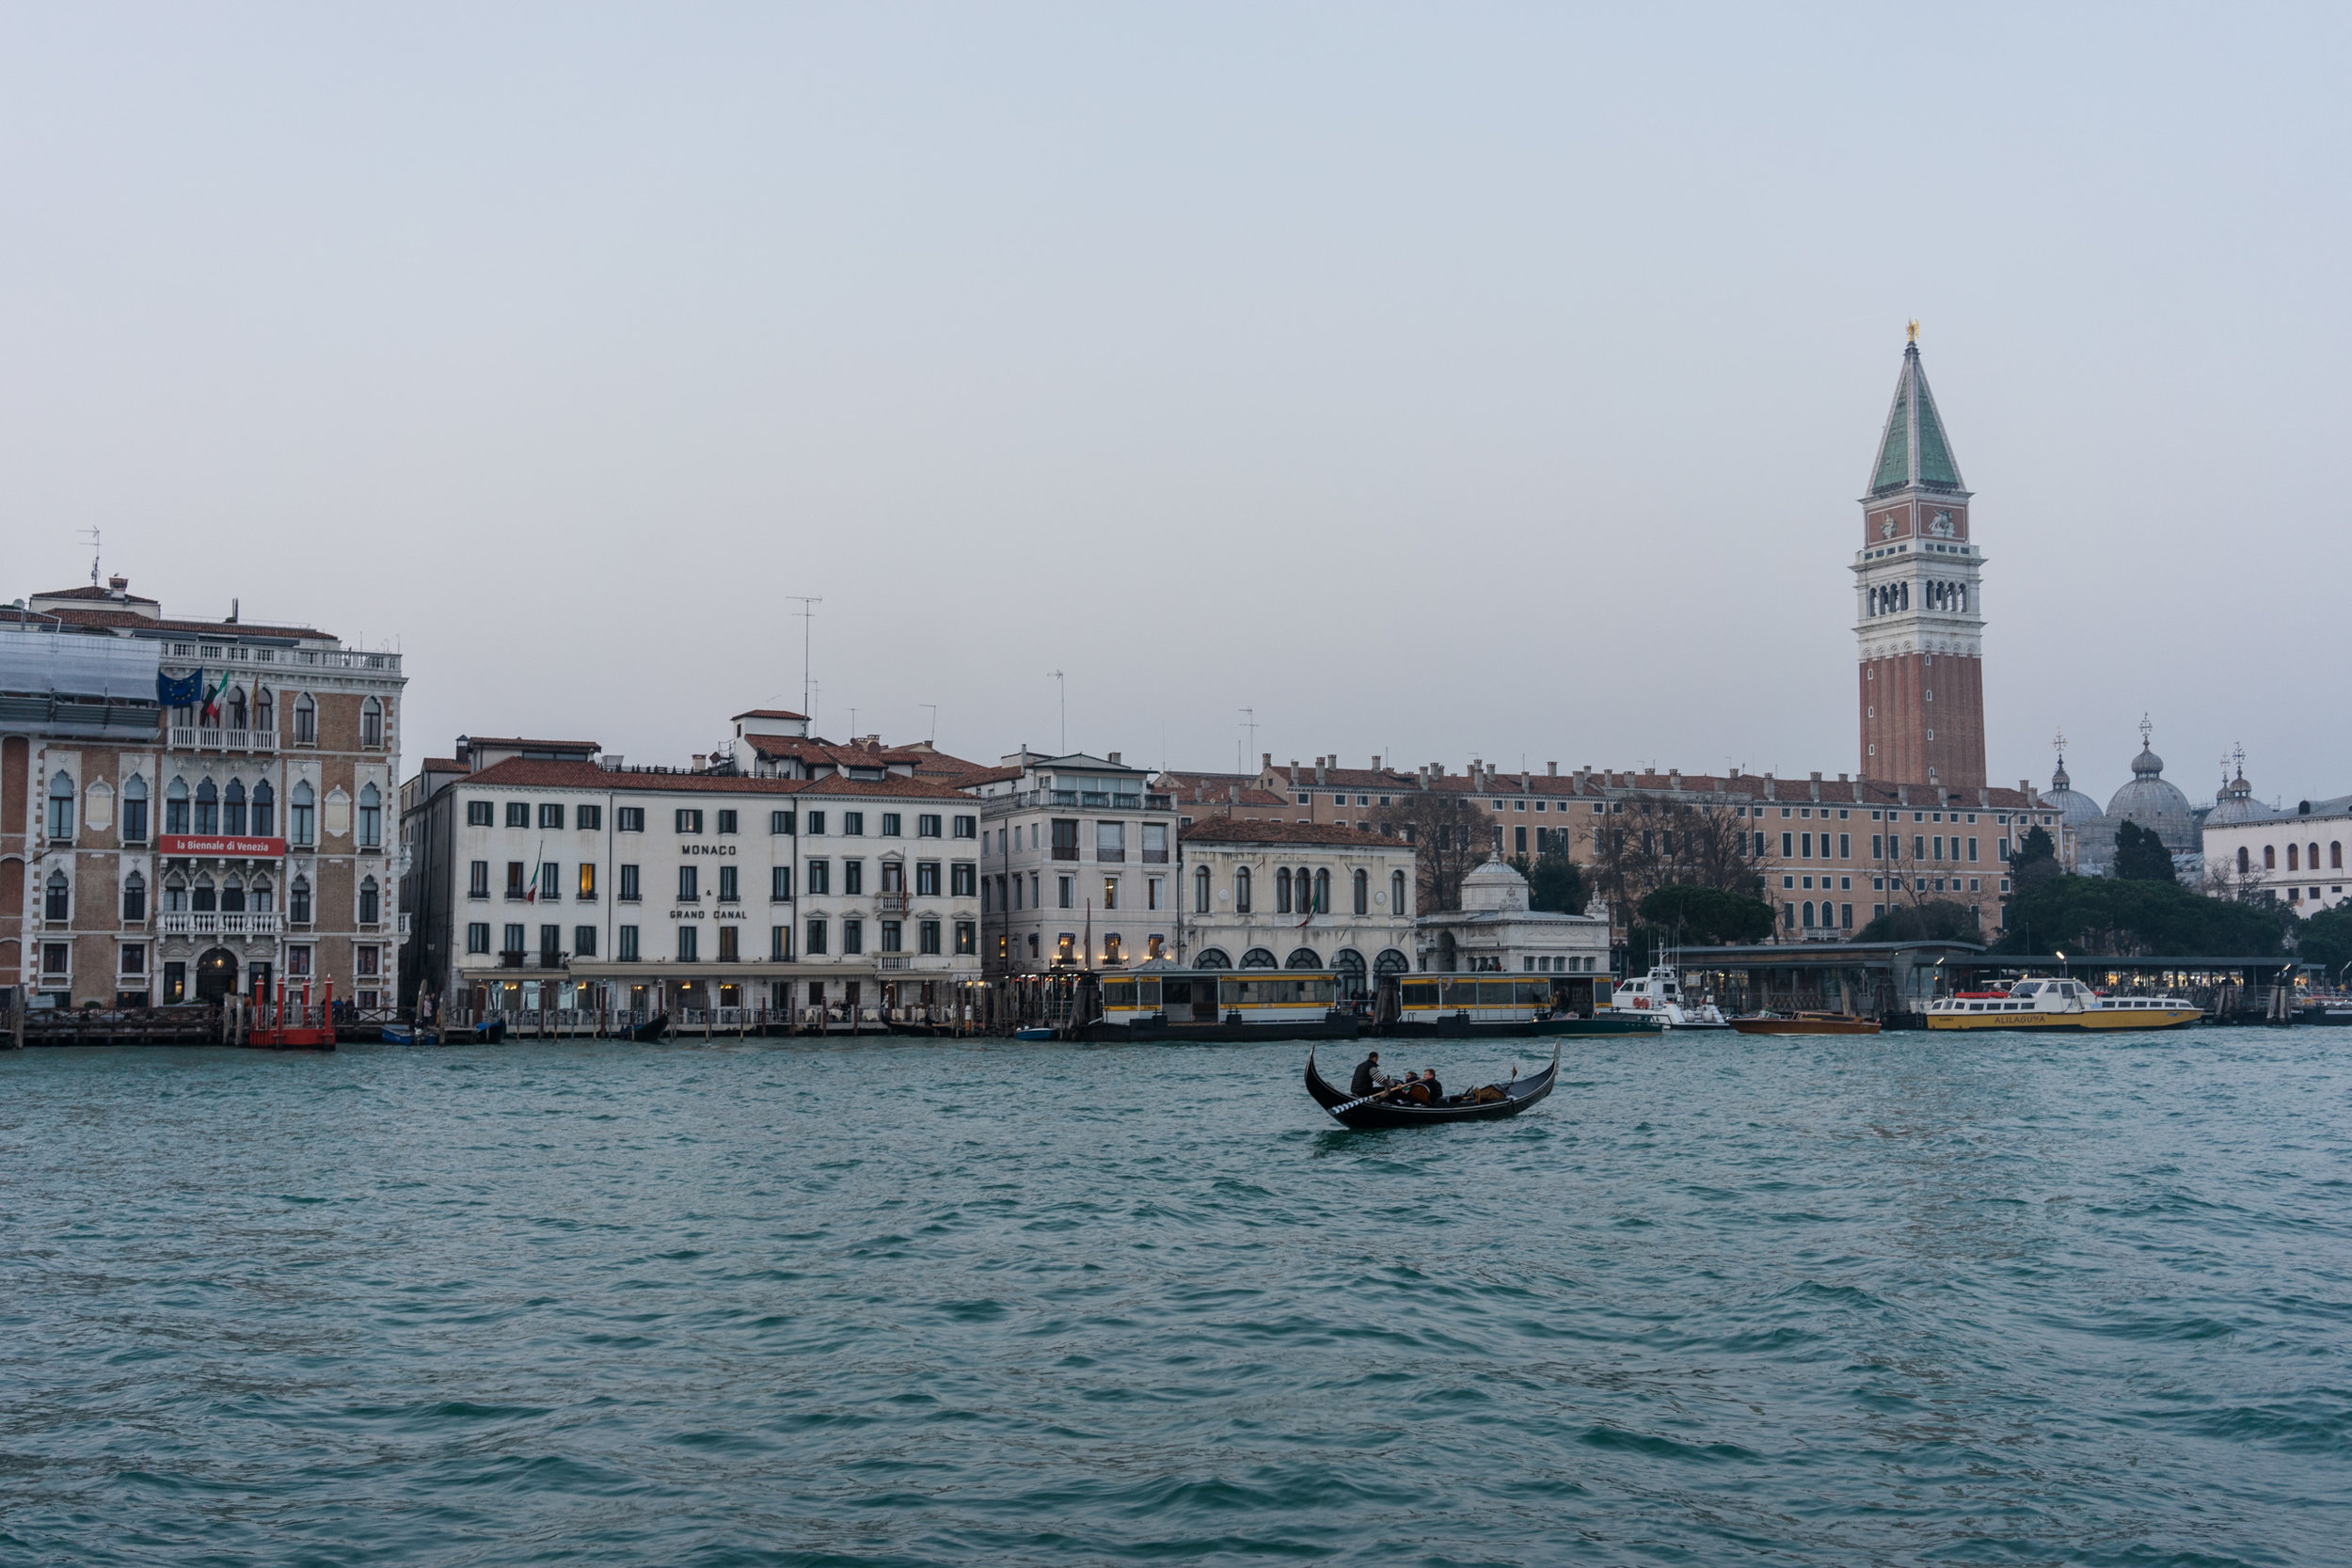 Venecia noche